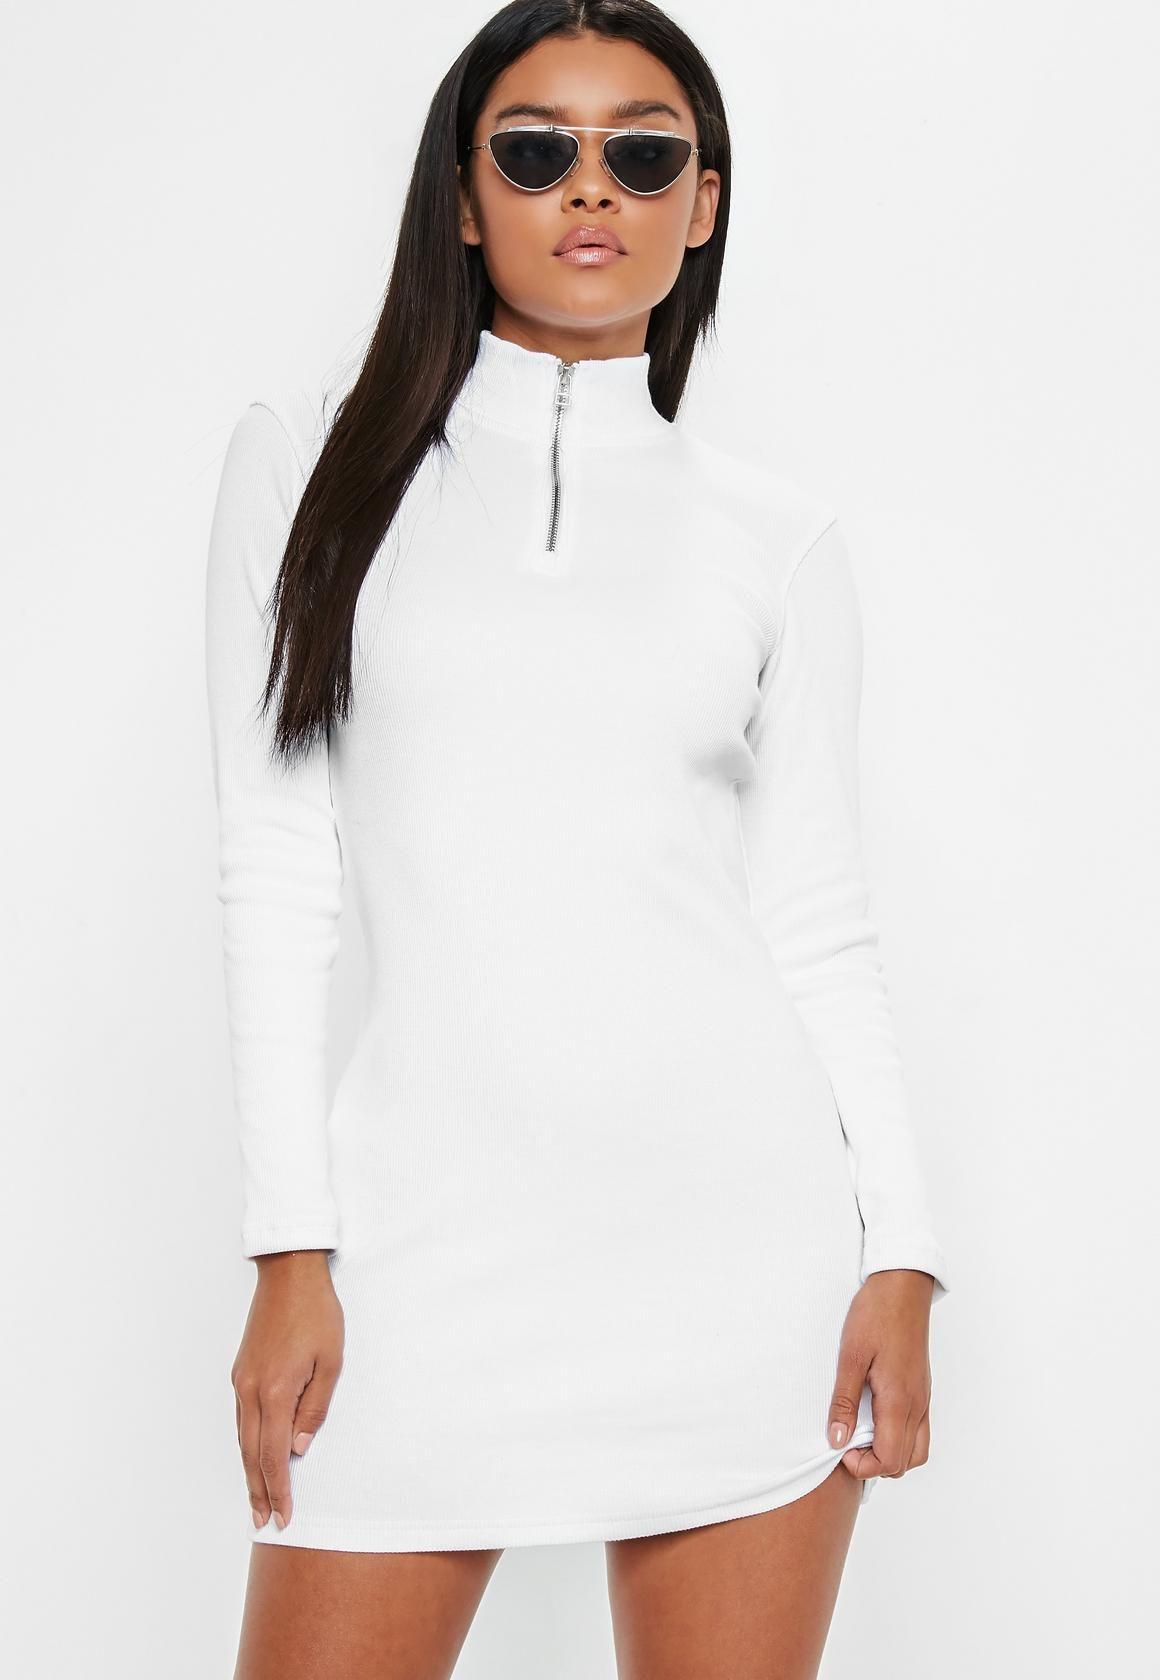 00d68fbbdd47 Missguided - White Zip Front Bodycon Mini Dress | My Closet ...